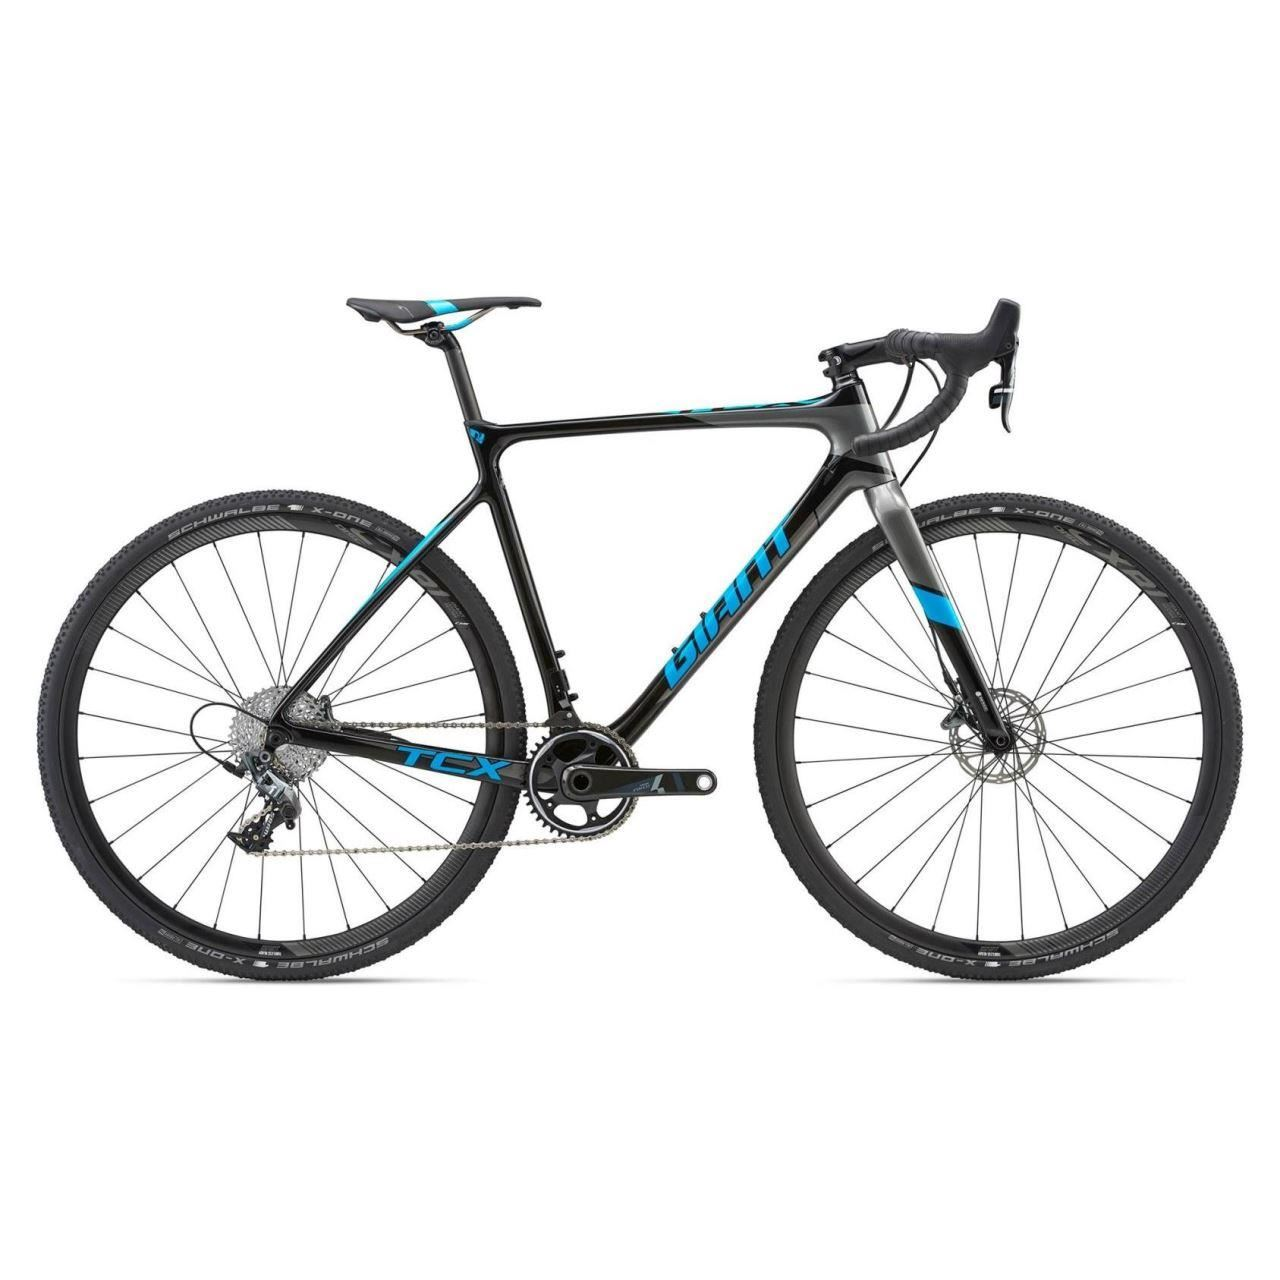 Bicicleta Giant TCX Advanced Pro 1 CARBON/BLUE/ 2018